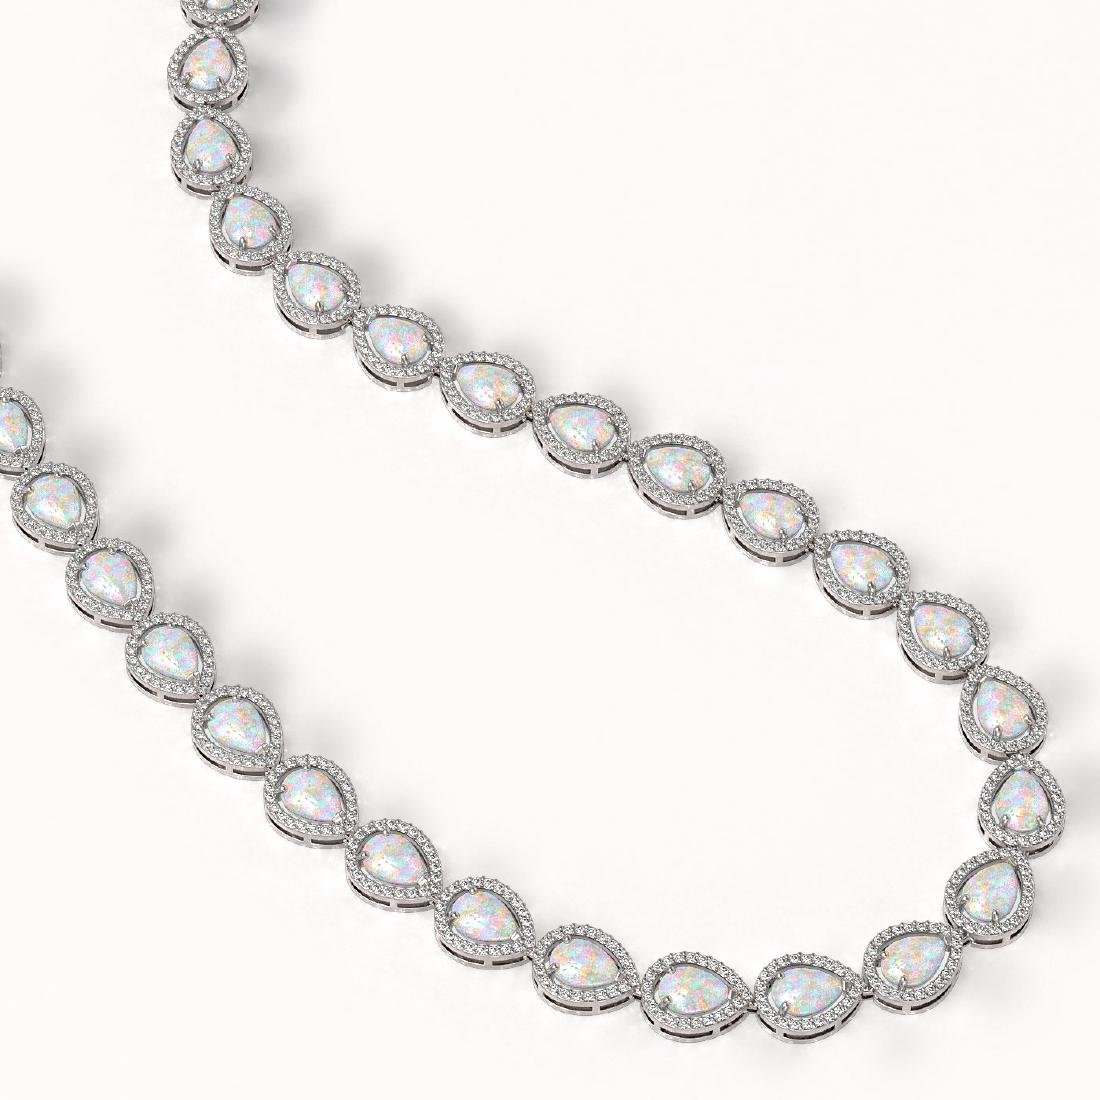 27.93 CTW Opal & Diamond Halo Necklace 10K White Gold - 2